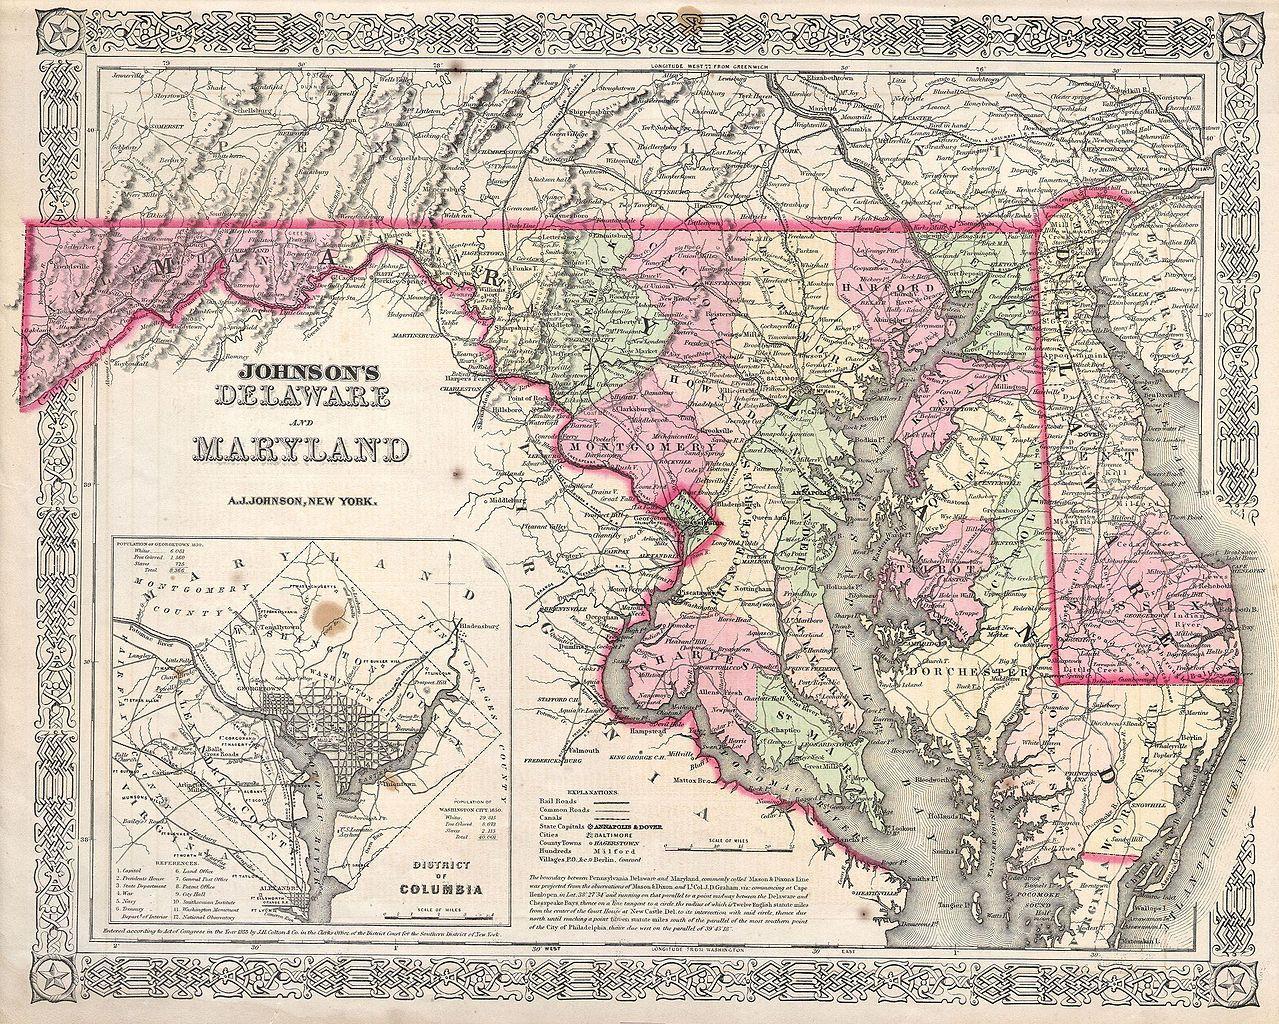 Map indicating the Mason Dixon line.